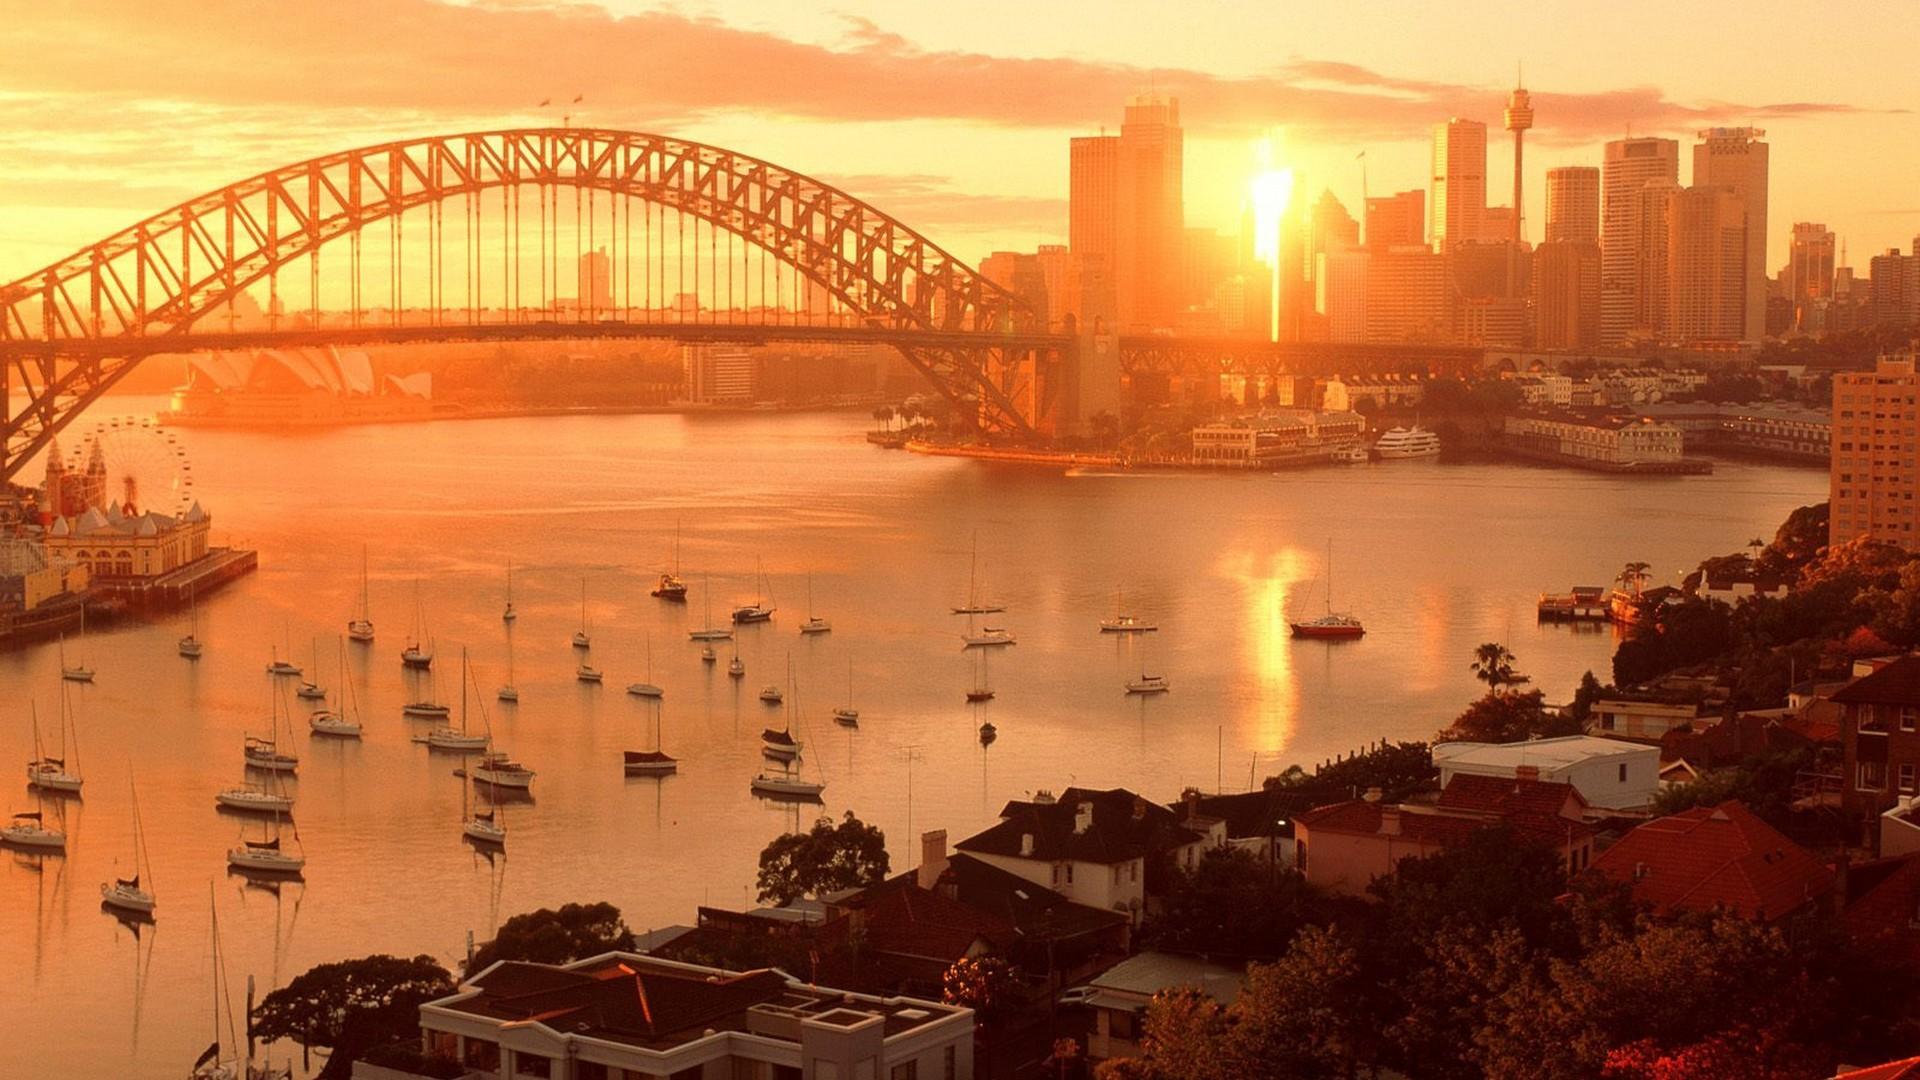 materials science week 2019 - Sydney ,Australia